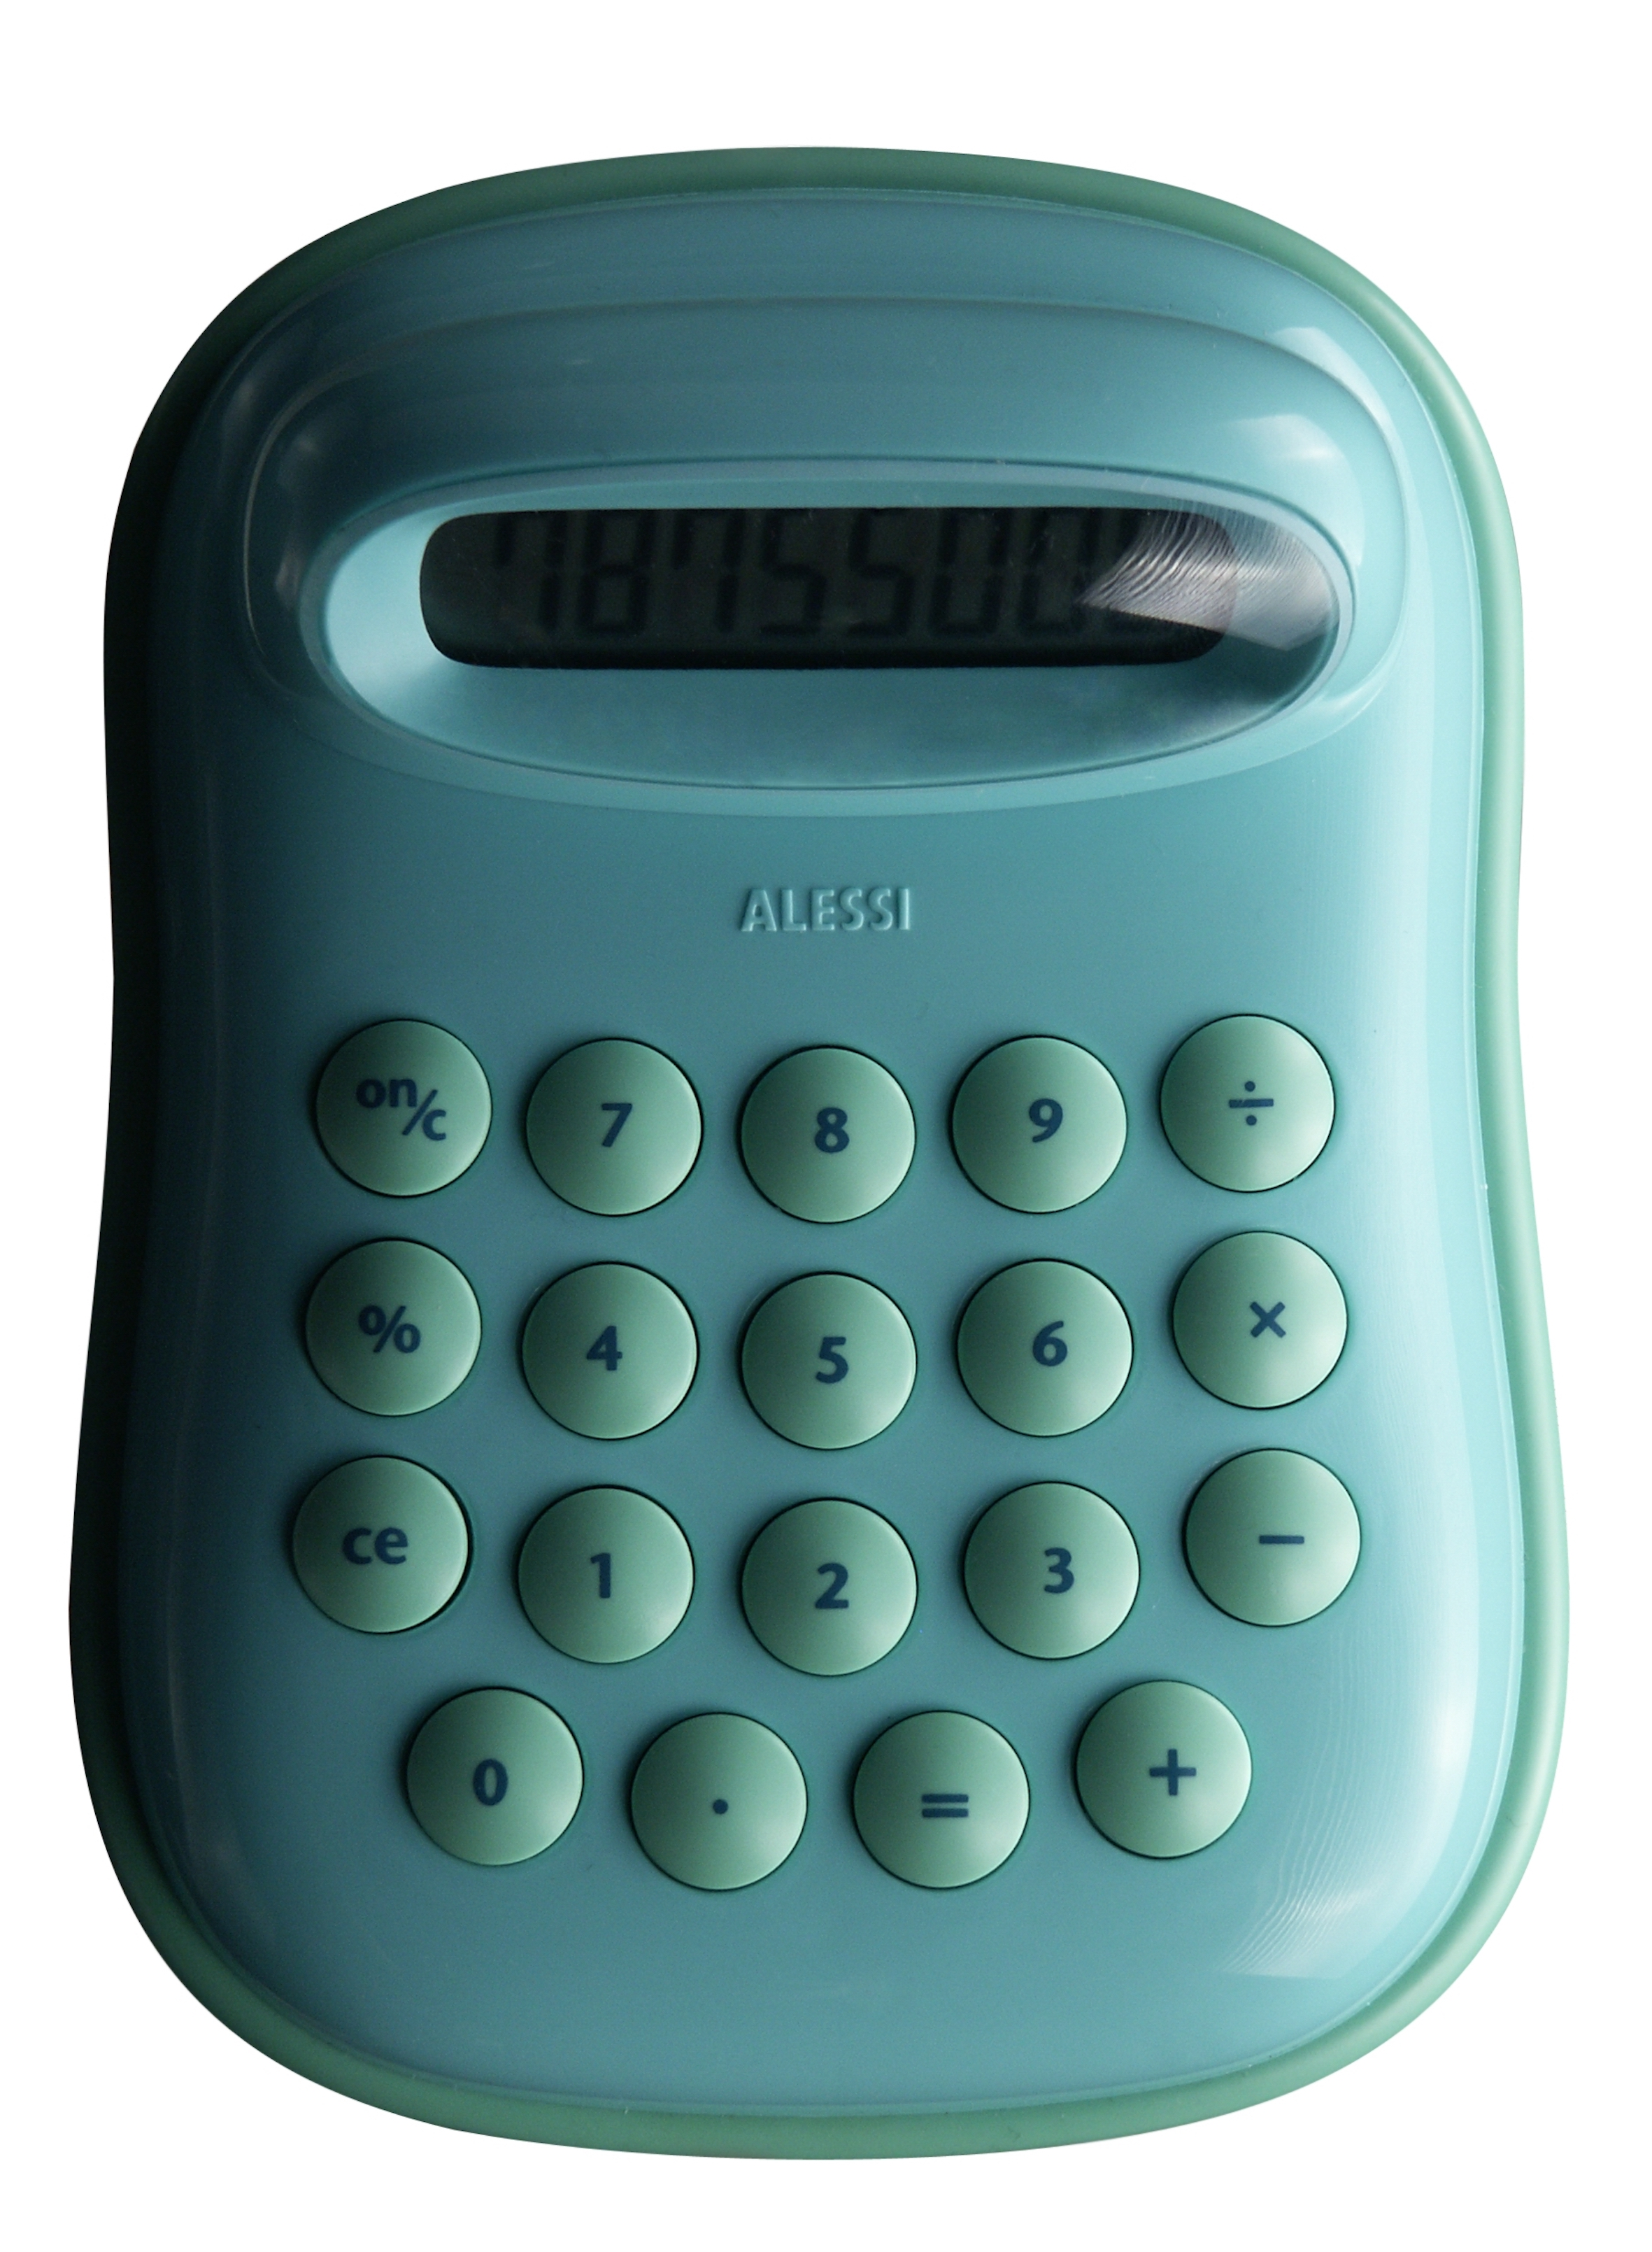 Calculator, Alessi, 1997